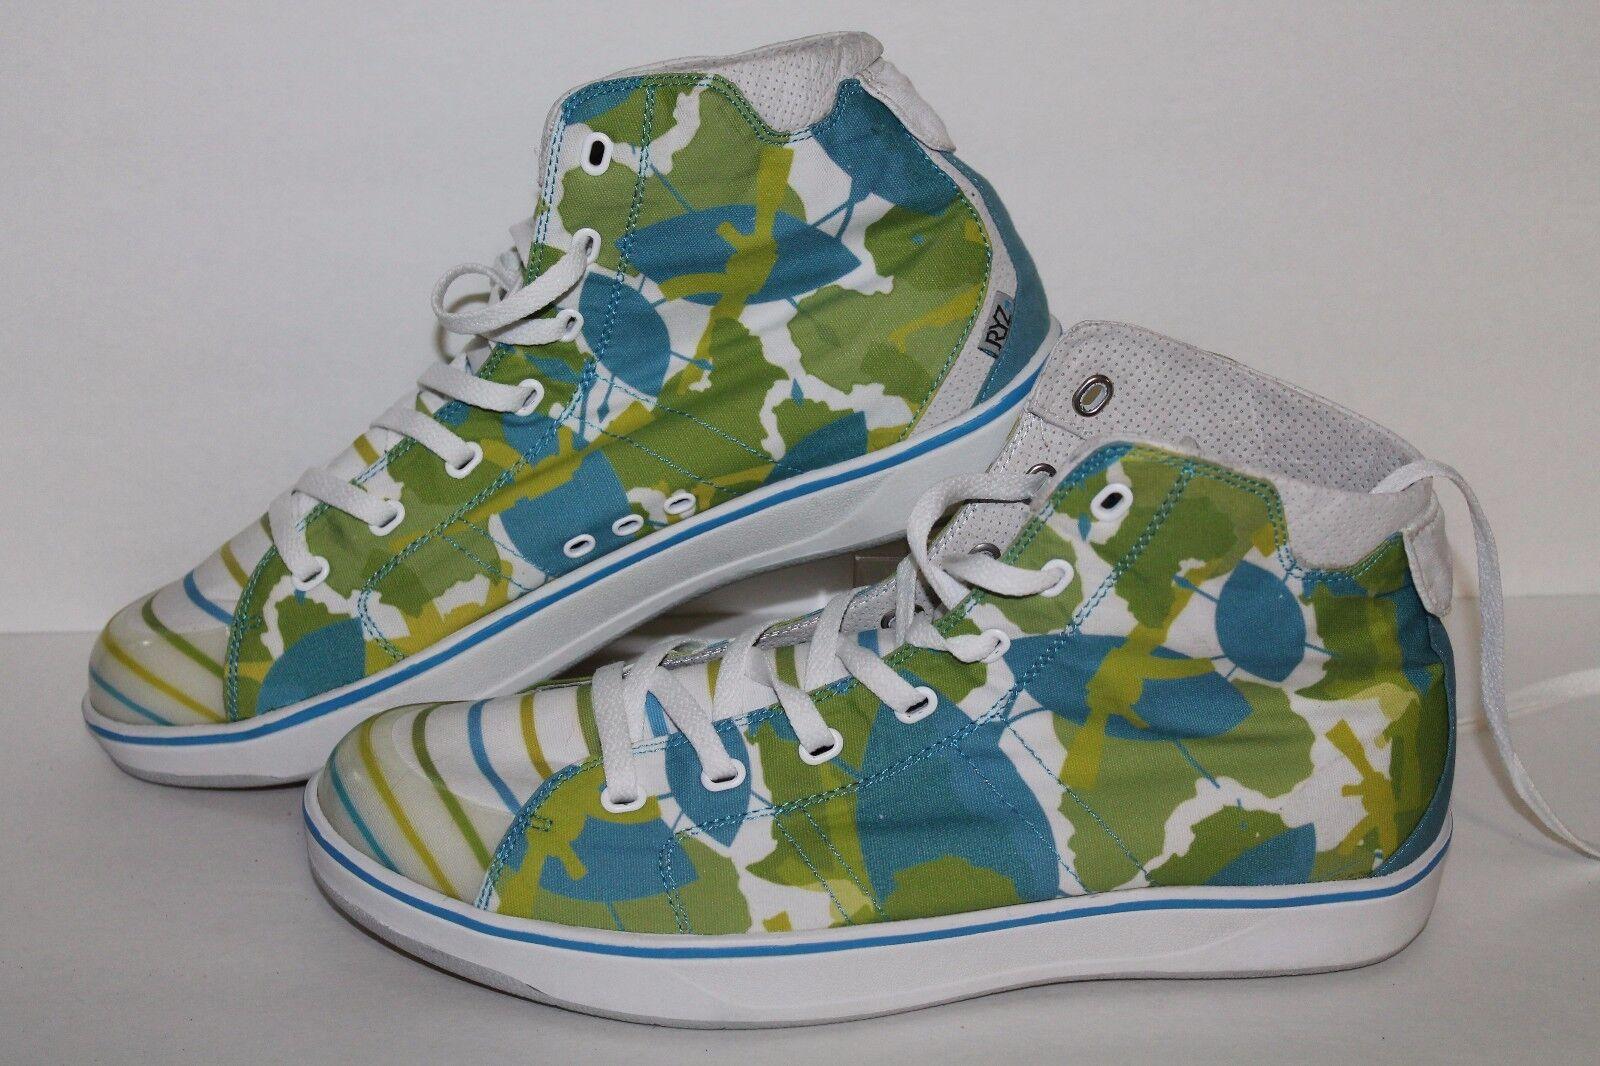 RYZ High Casual Sneakers, Wht/Blue/Green, Men's US Size 12